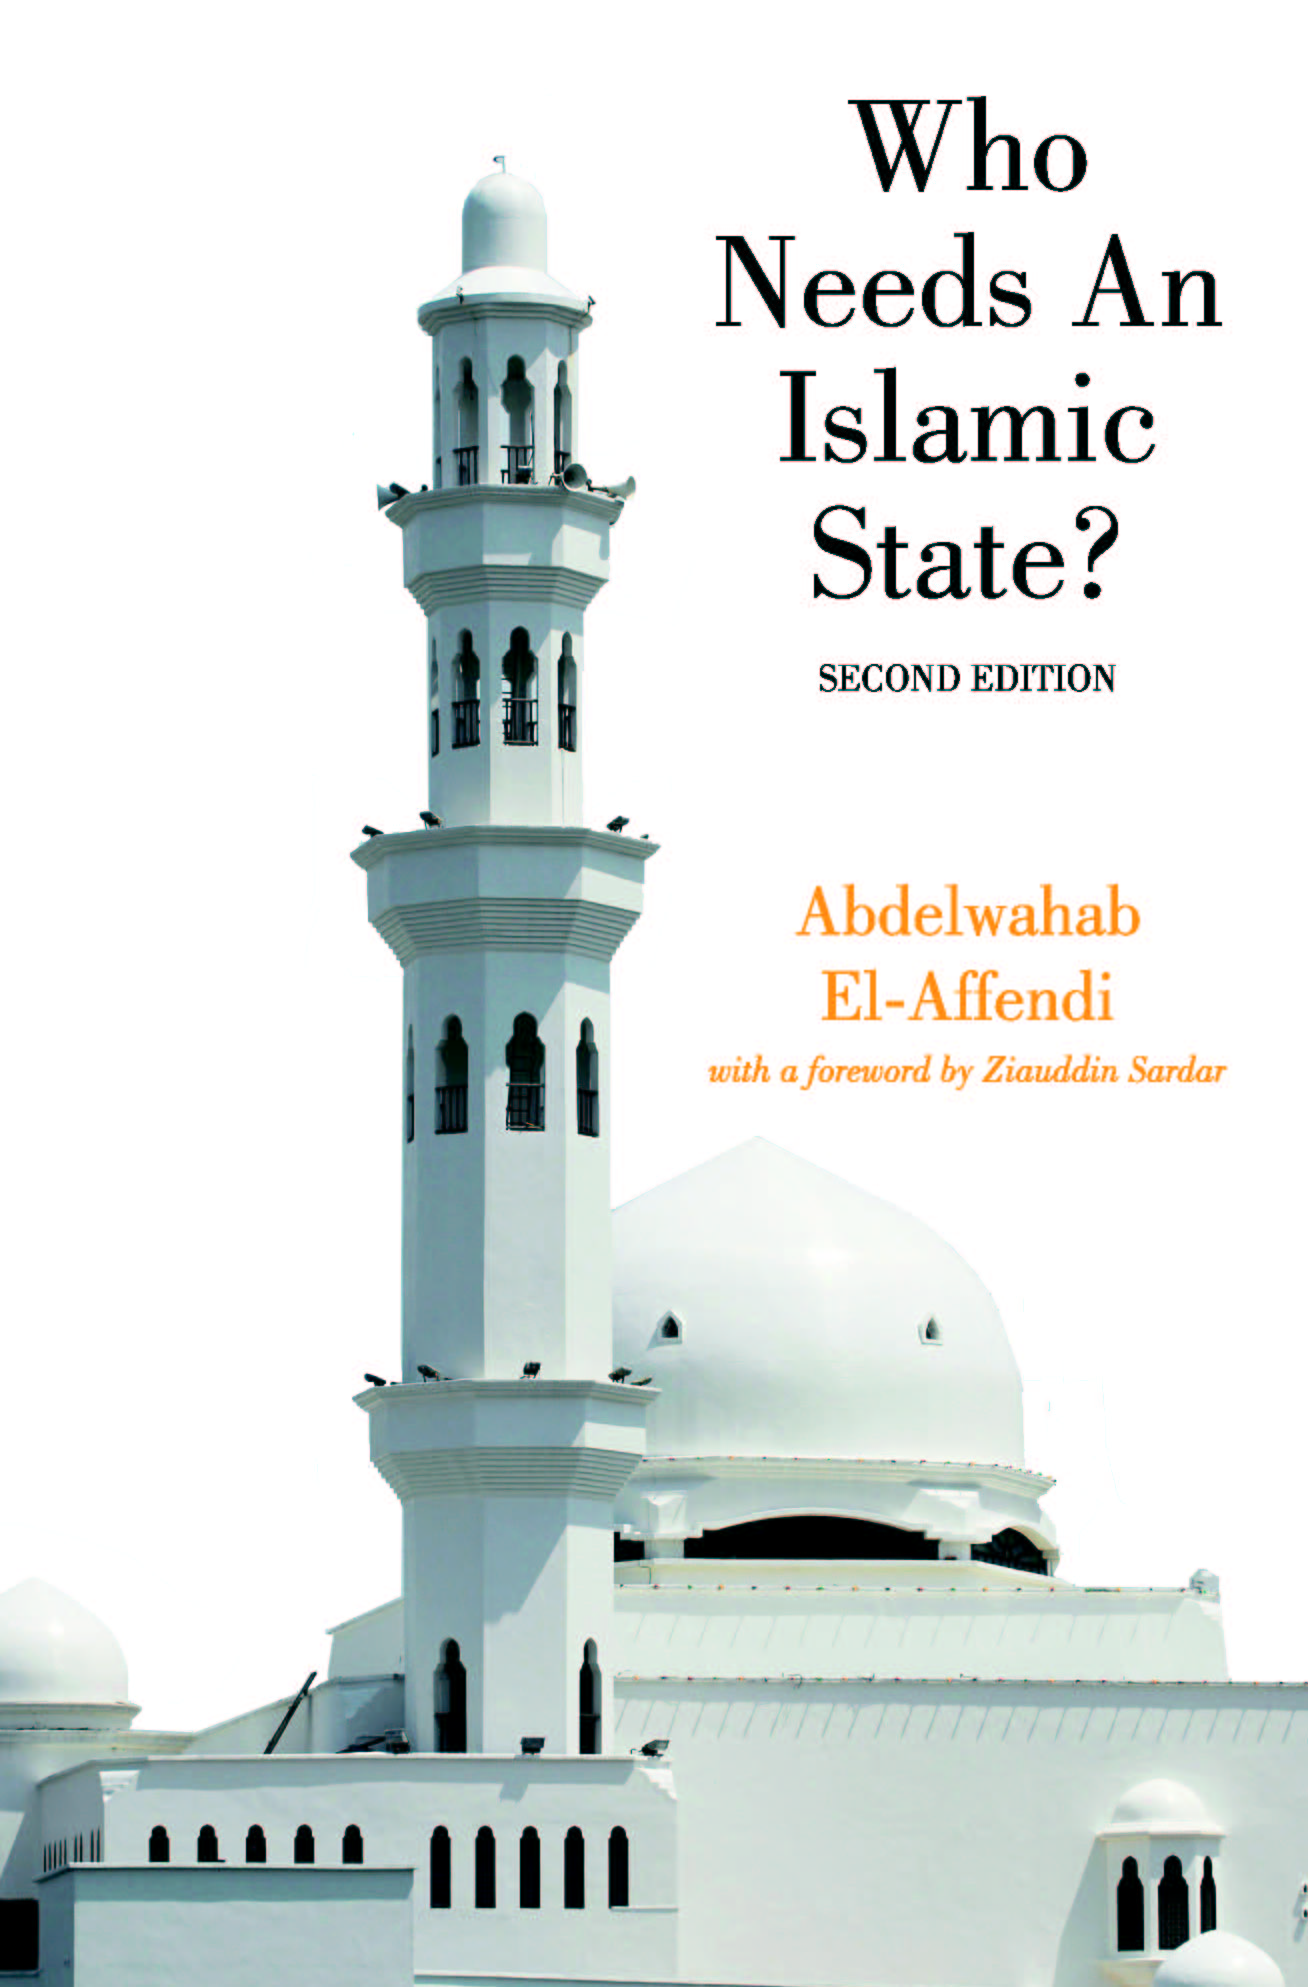 Who Needs an Islamic State?